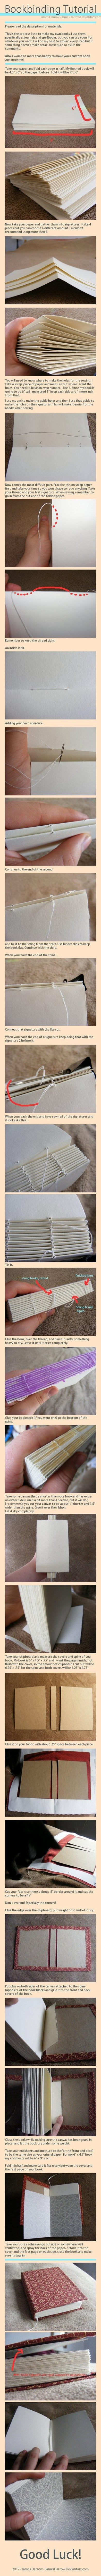 Standard Case bound book - Click image to find more DIY & Crafts Pinterest pins